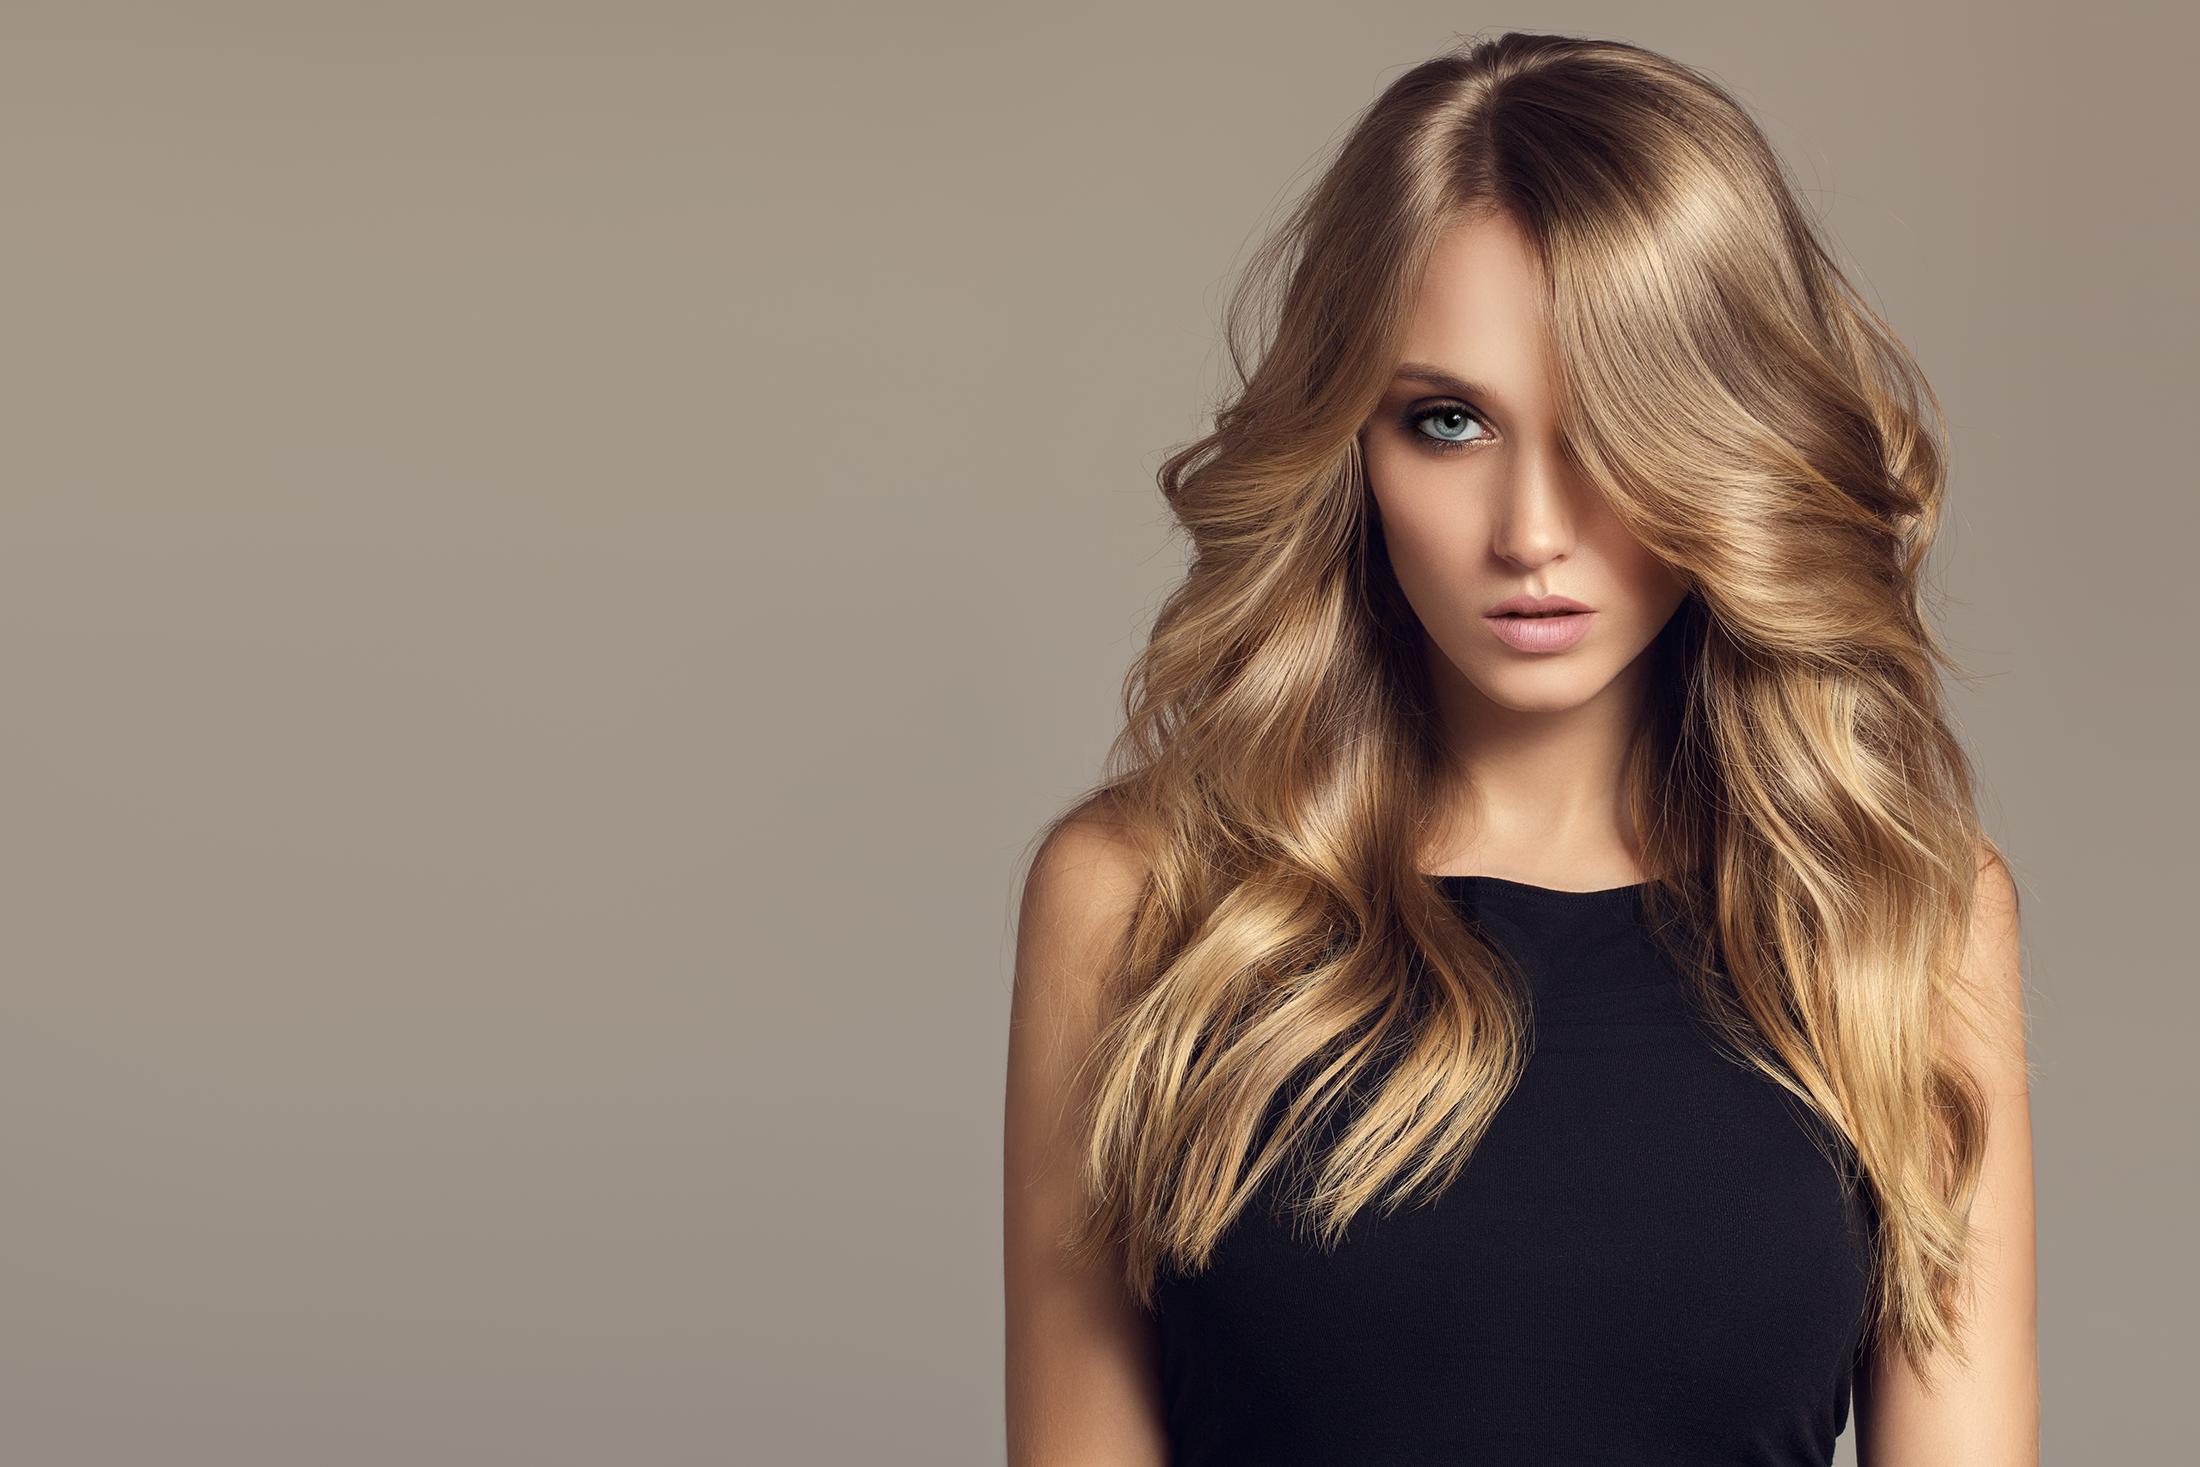 hair models — blackthesalon